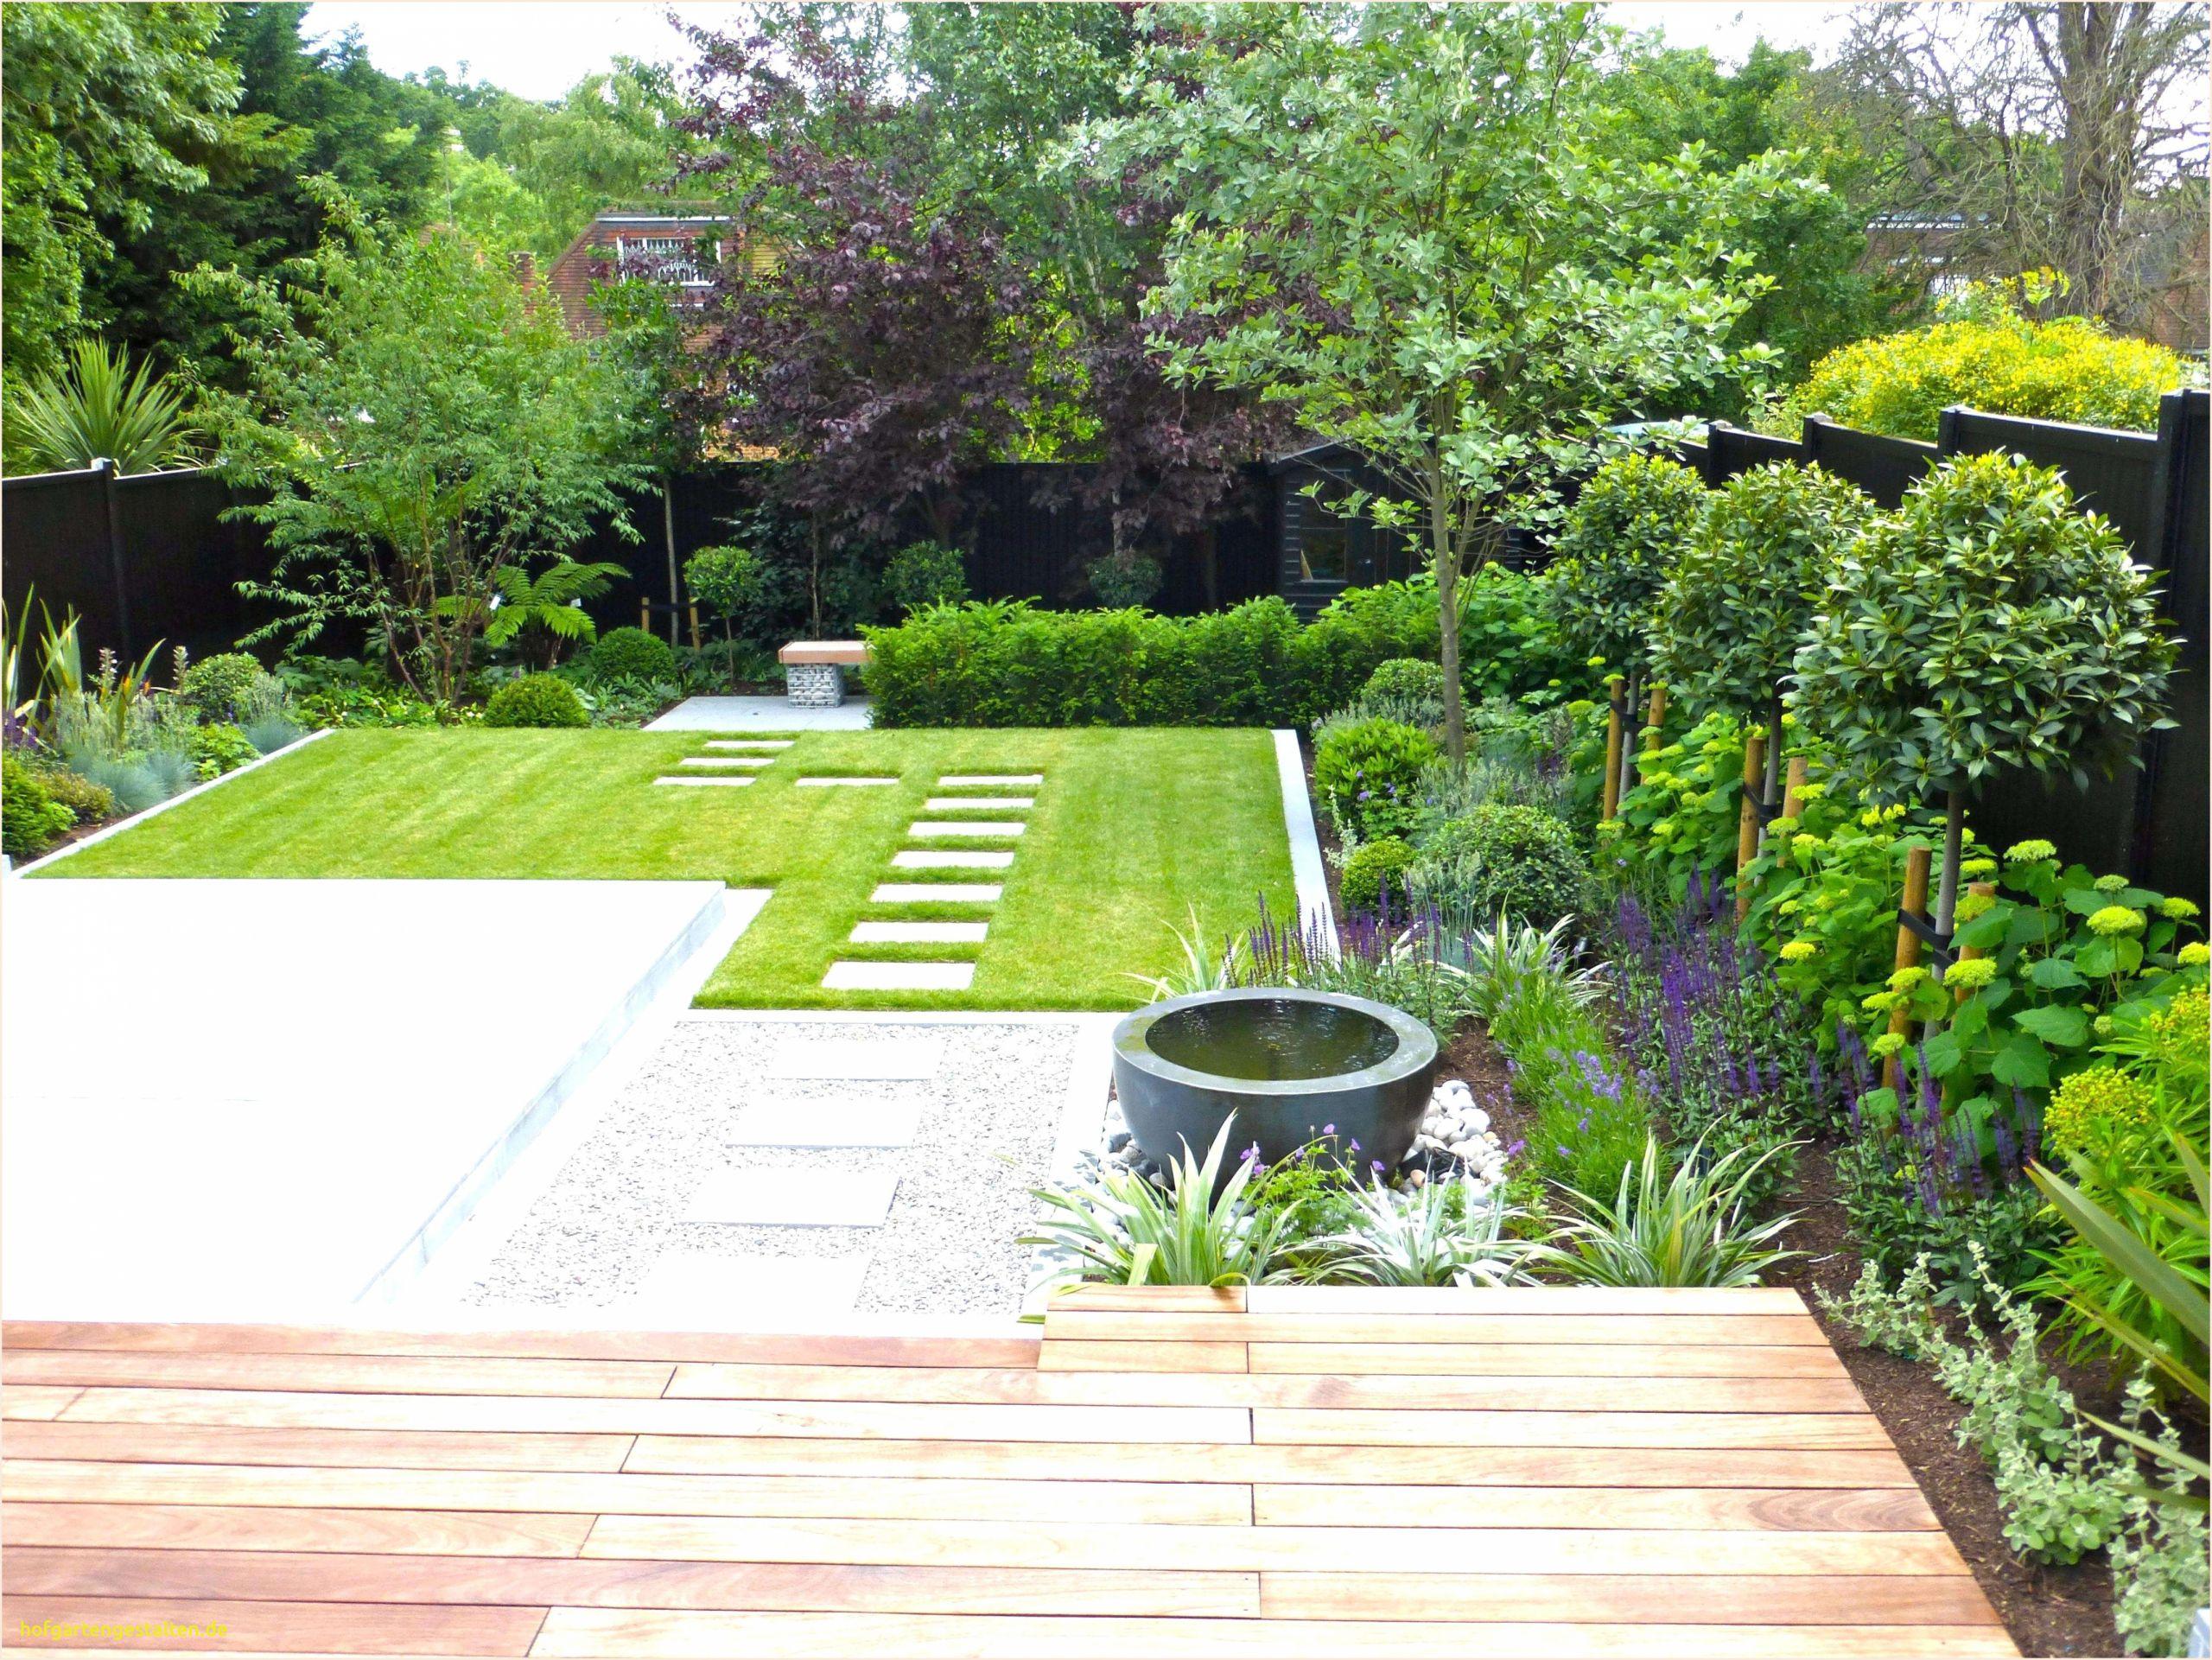 Deko Garten Edelstahl Inspirierend Deko Garten Selber Machen — Temobardz Home Blog